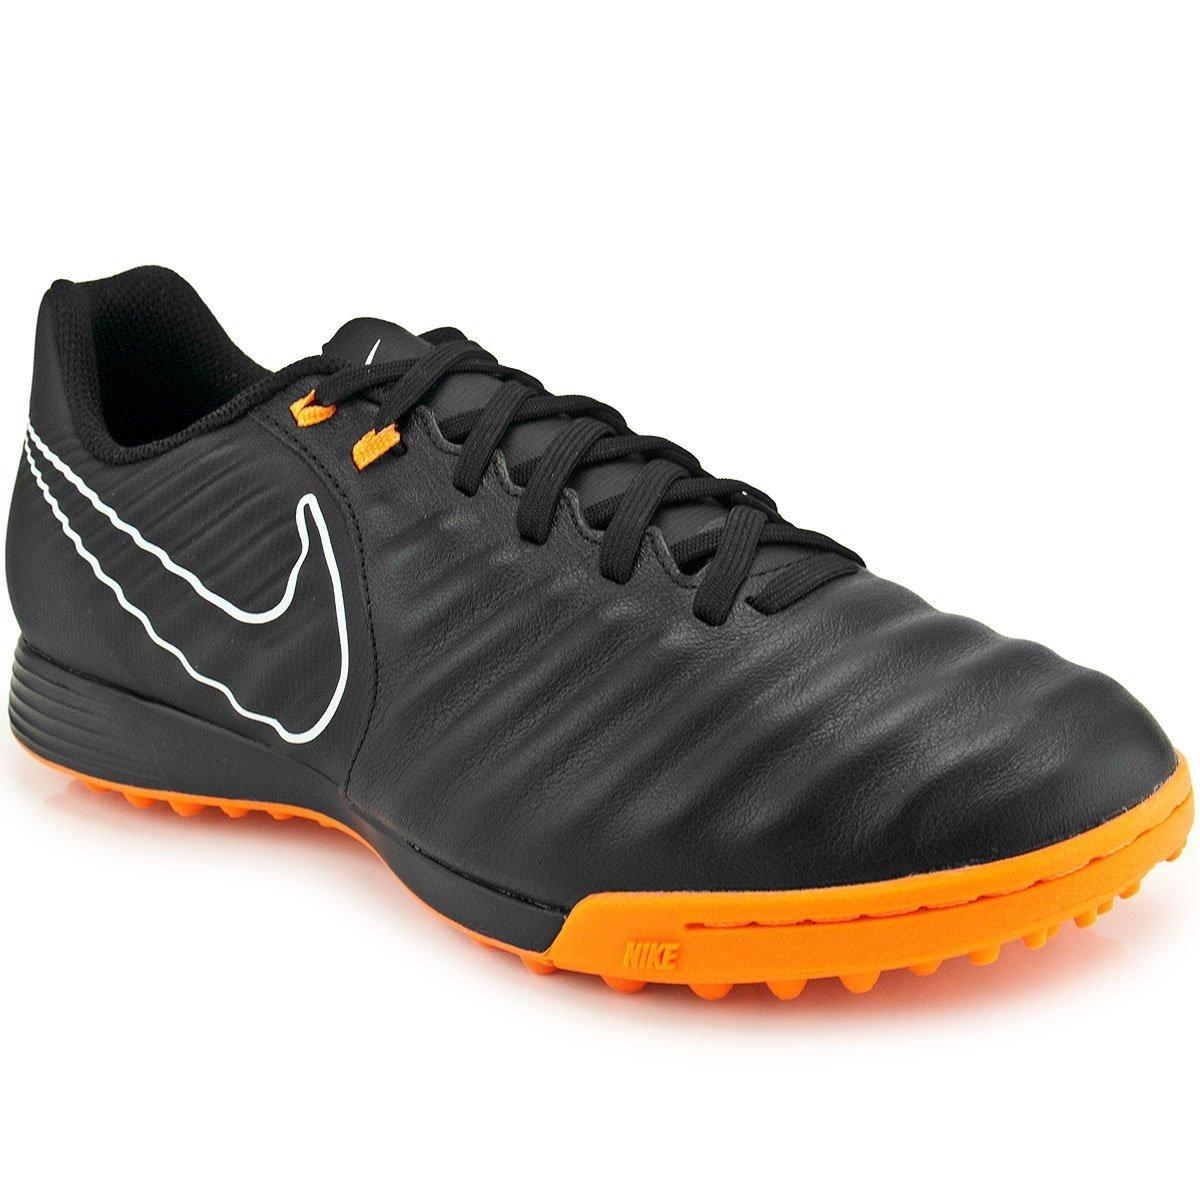 the best attitude 2c100 89c40 Chuteira Nike Tiempo Legendx 7 Academy Tf Society - Original